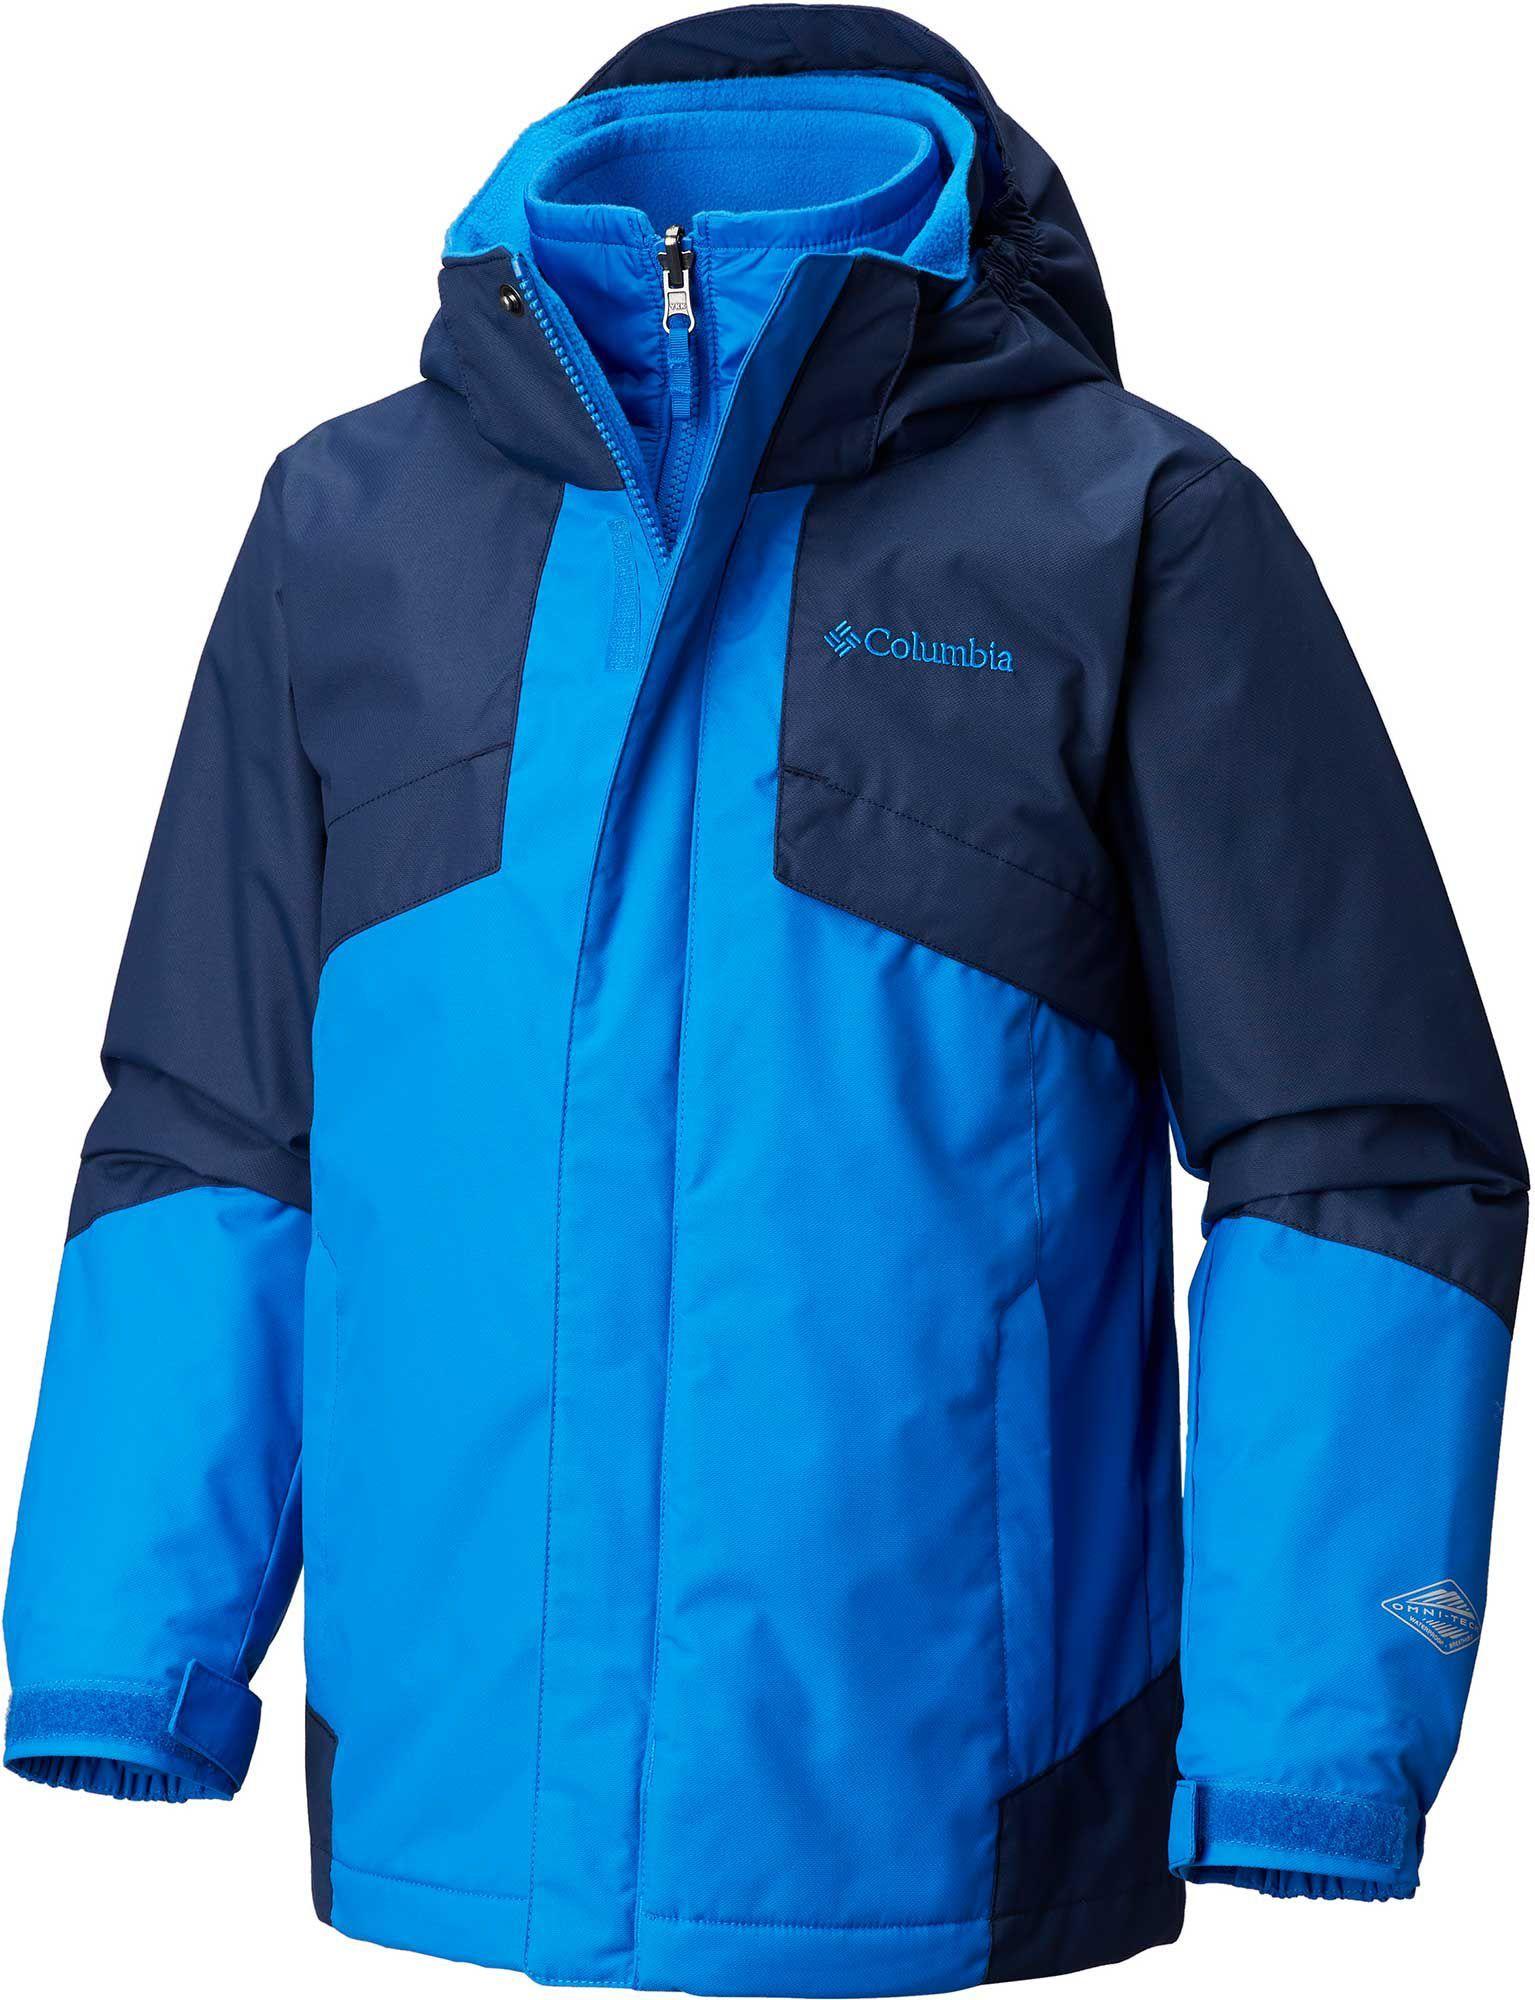 4afdb5850 Columbia Boys' Bugaboo Interchange Jacket, Blue | Products | Jackets ...